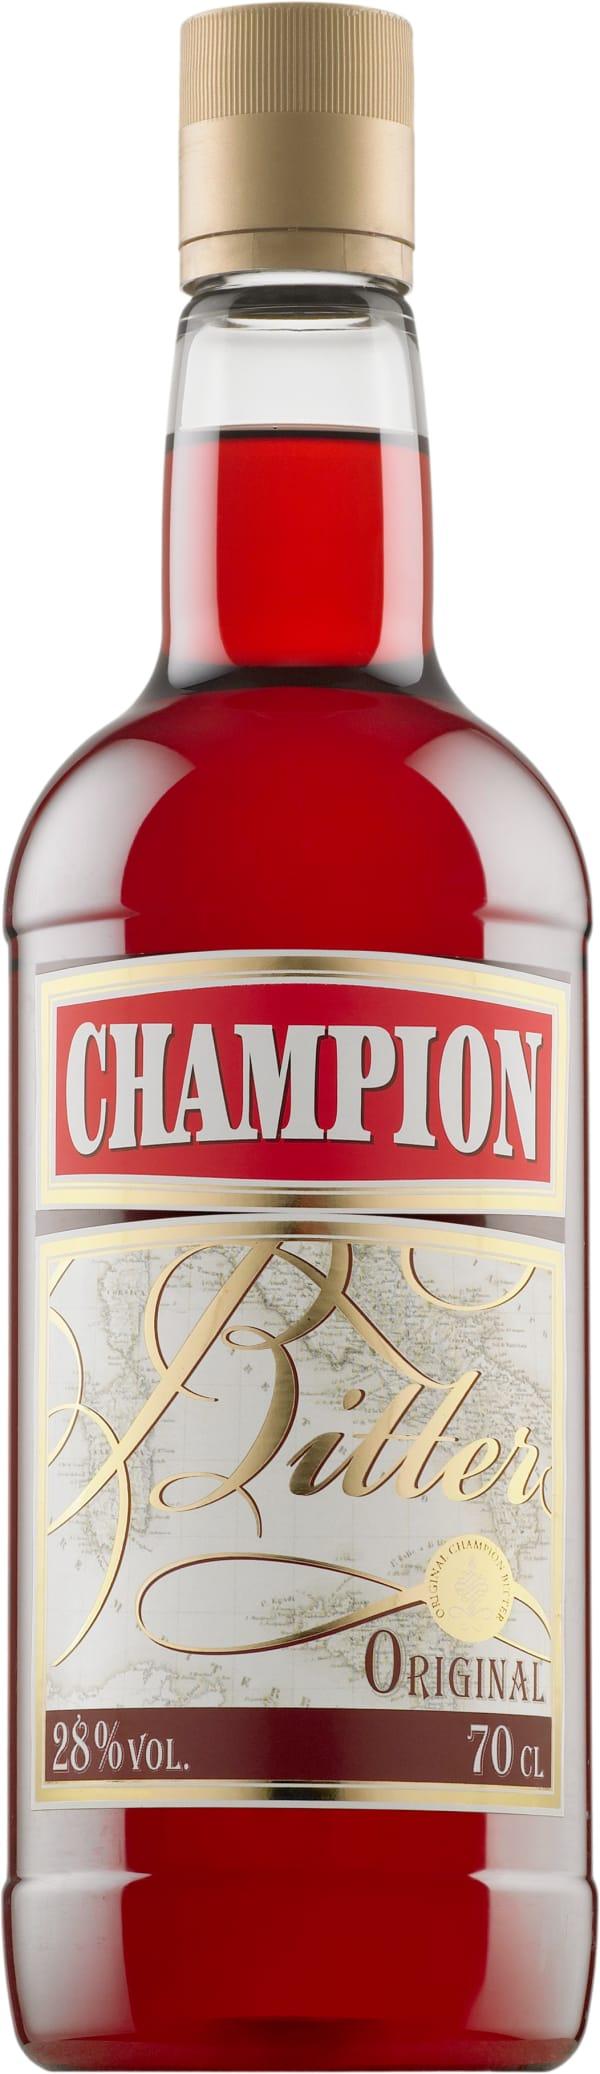 Champion plastic bottle